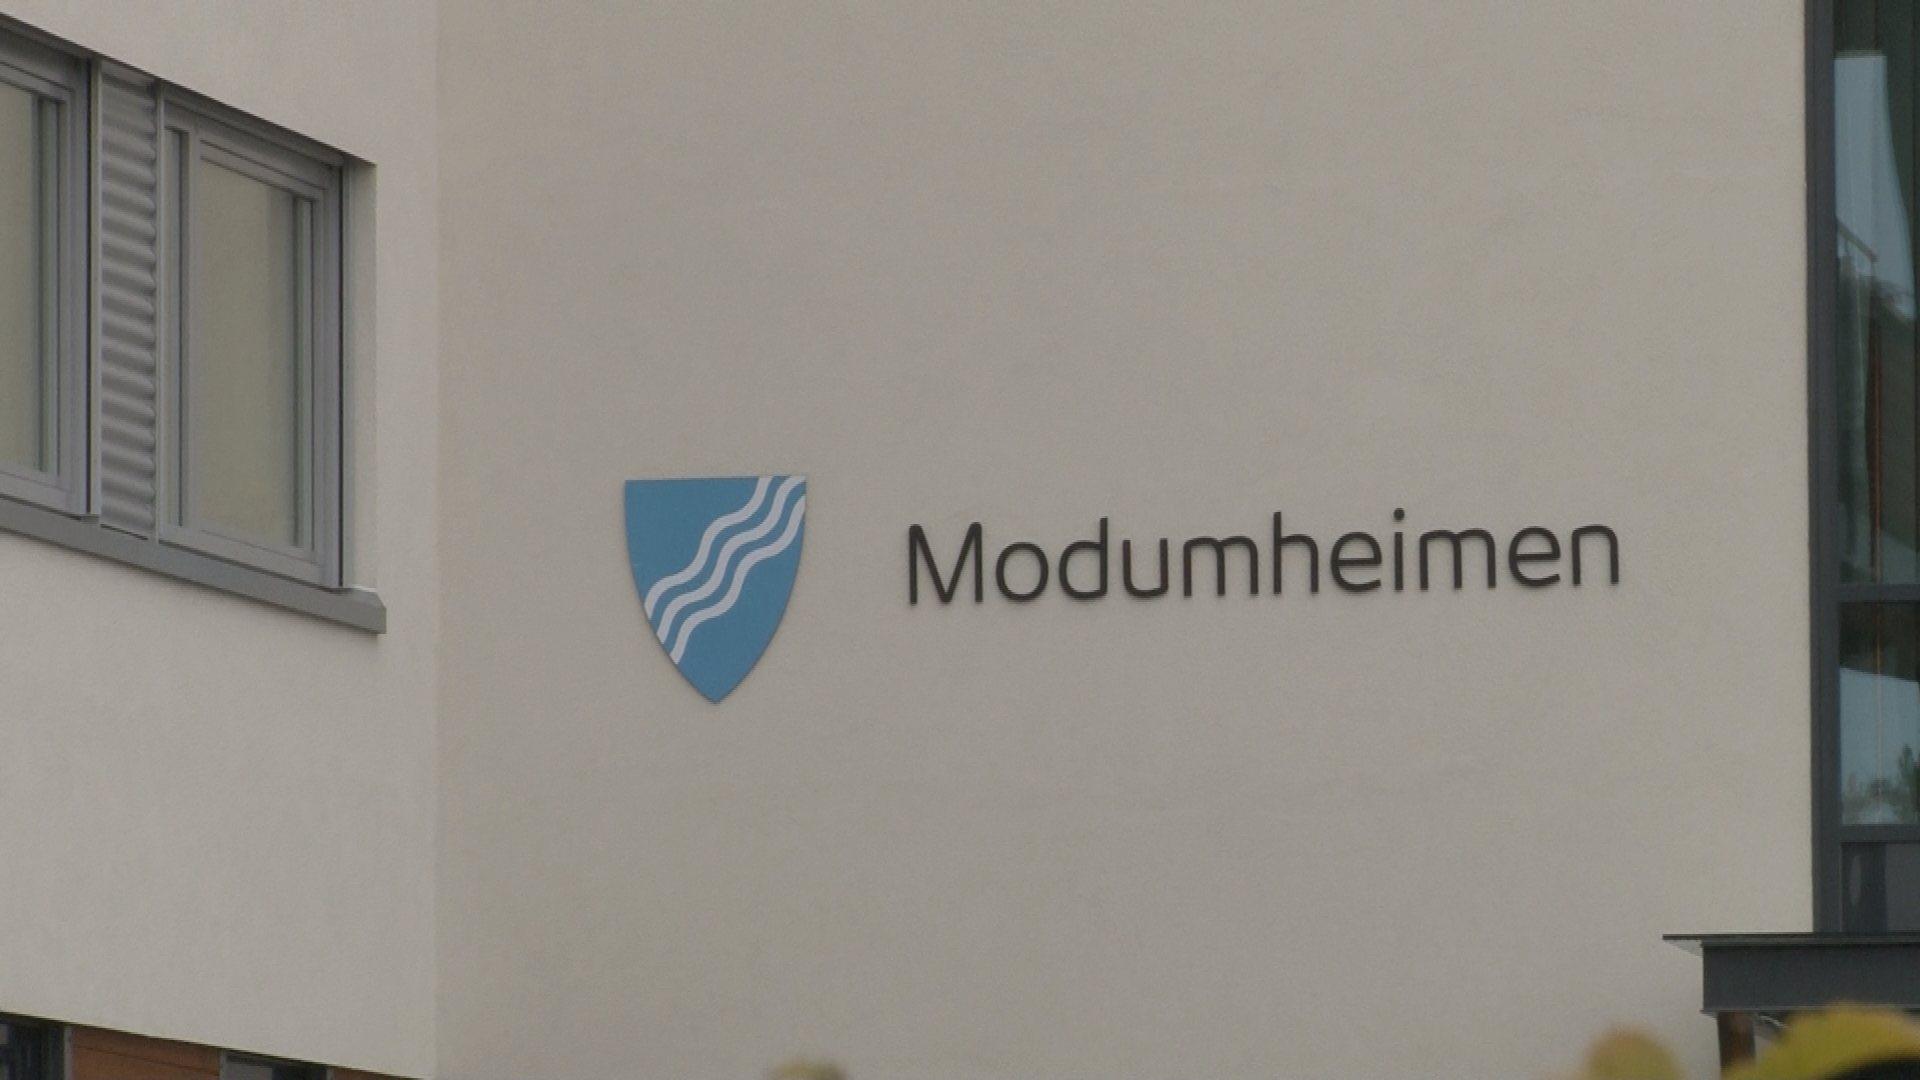 Fem smittet Ved Modumheimen